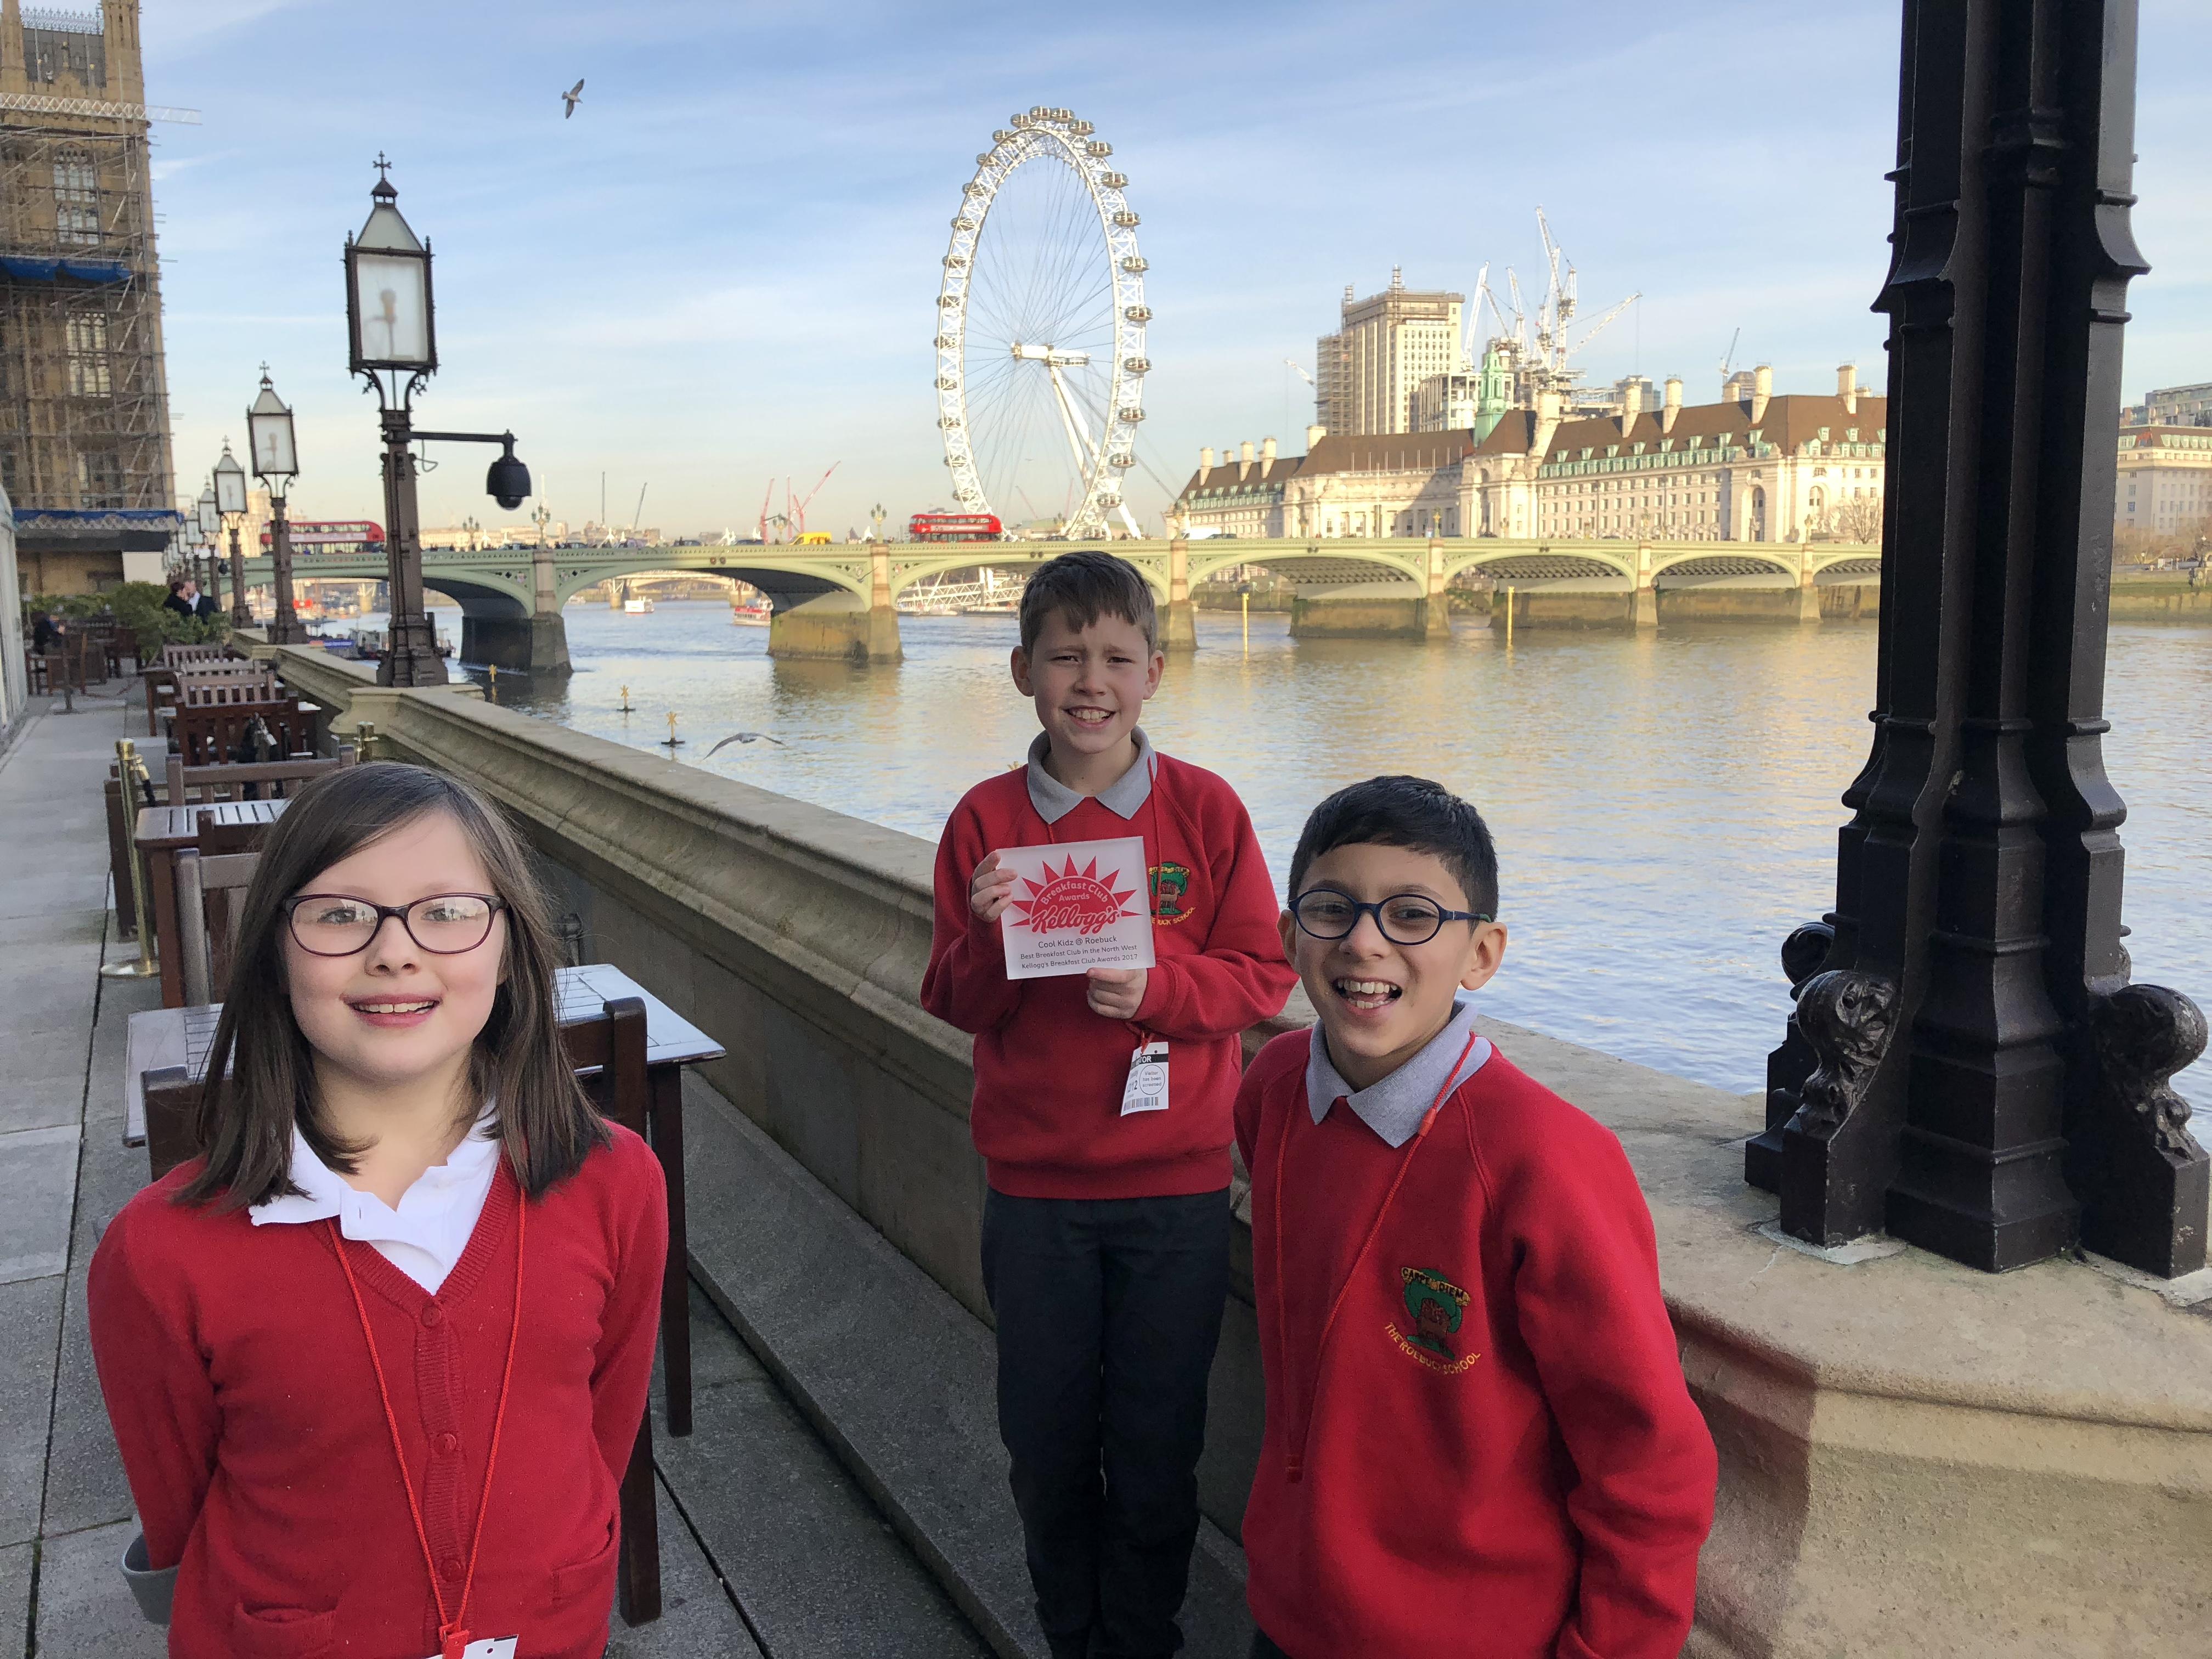 Cool Kidz Roebuck Breakfast Club award winners exploring London